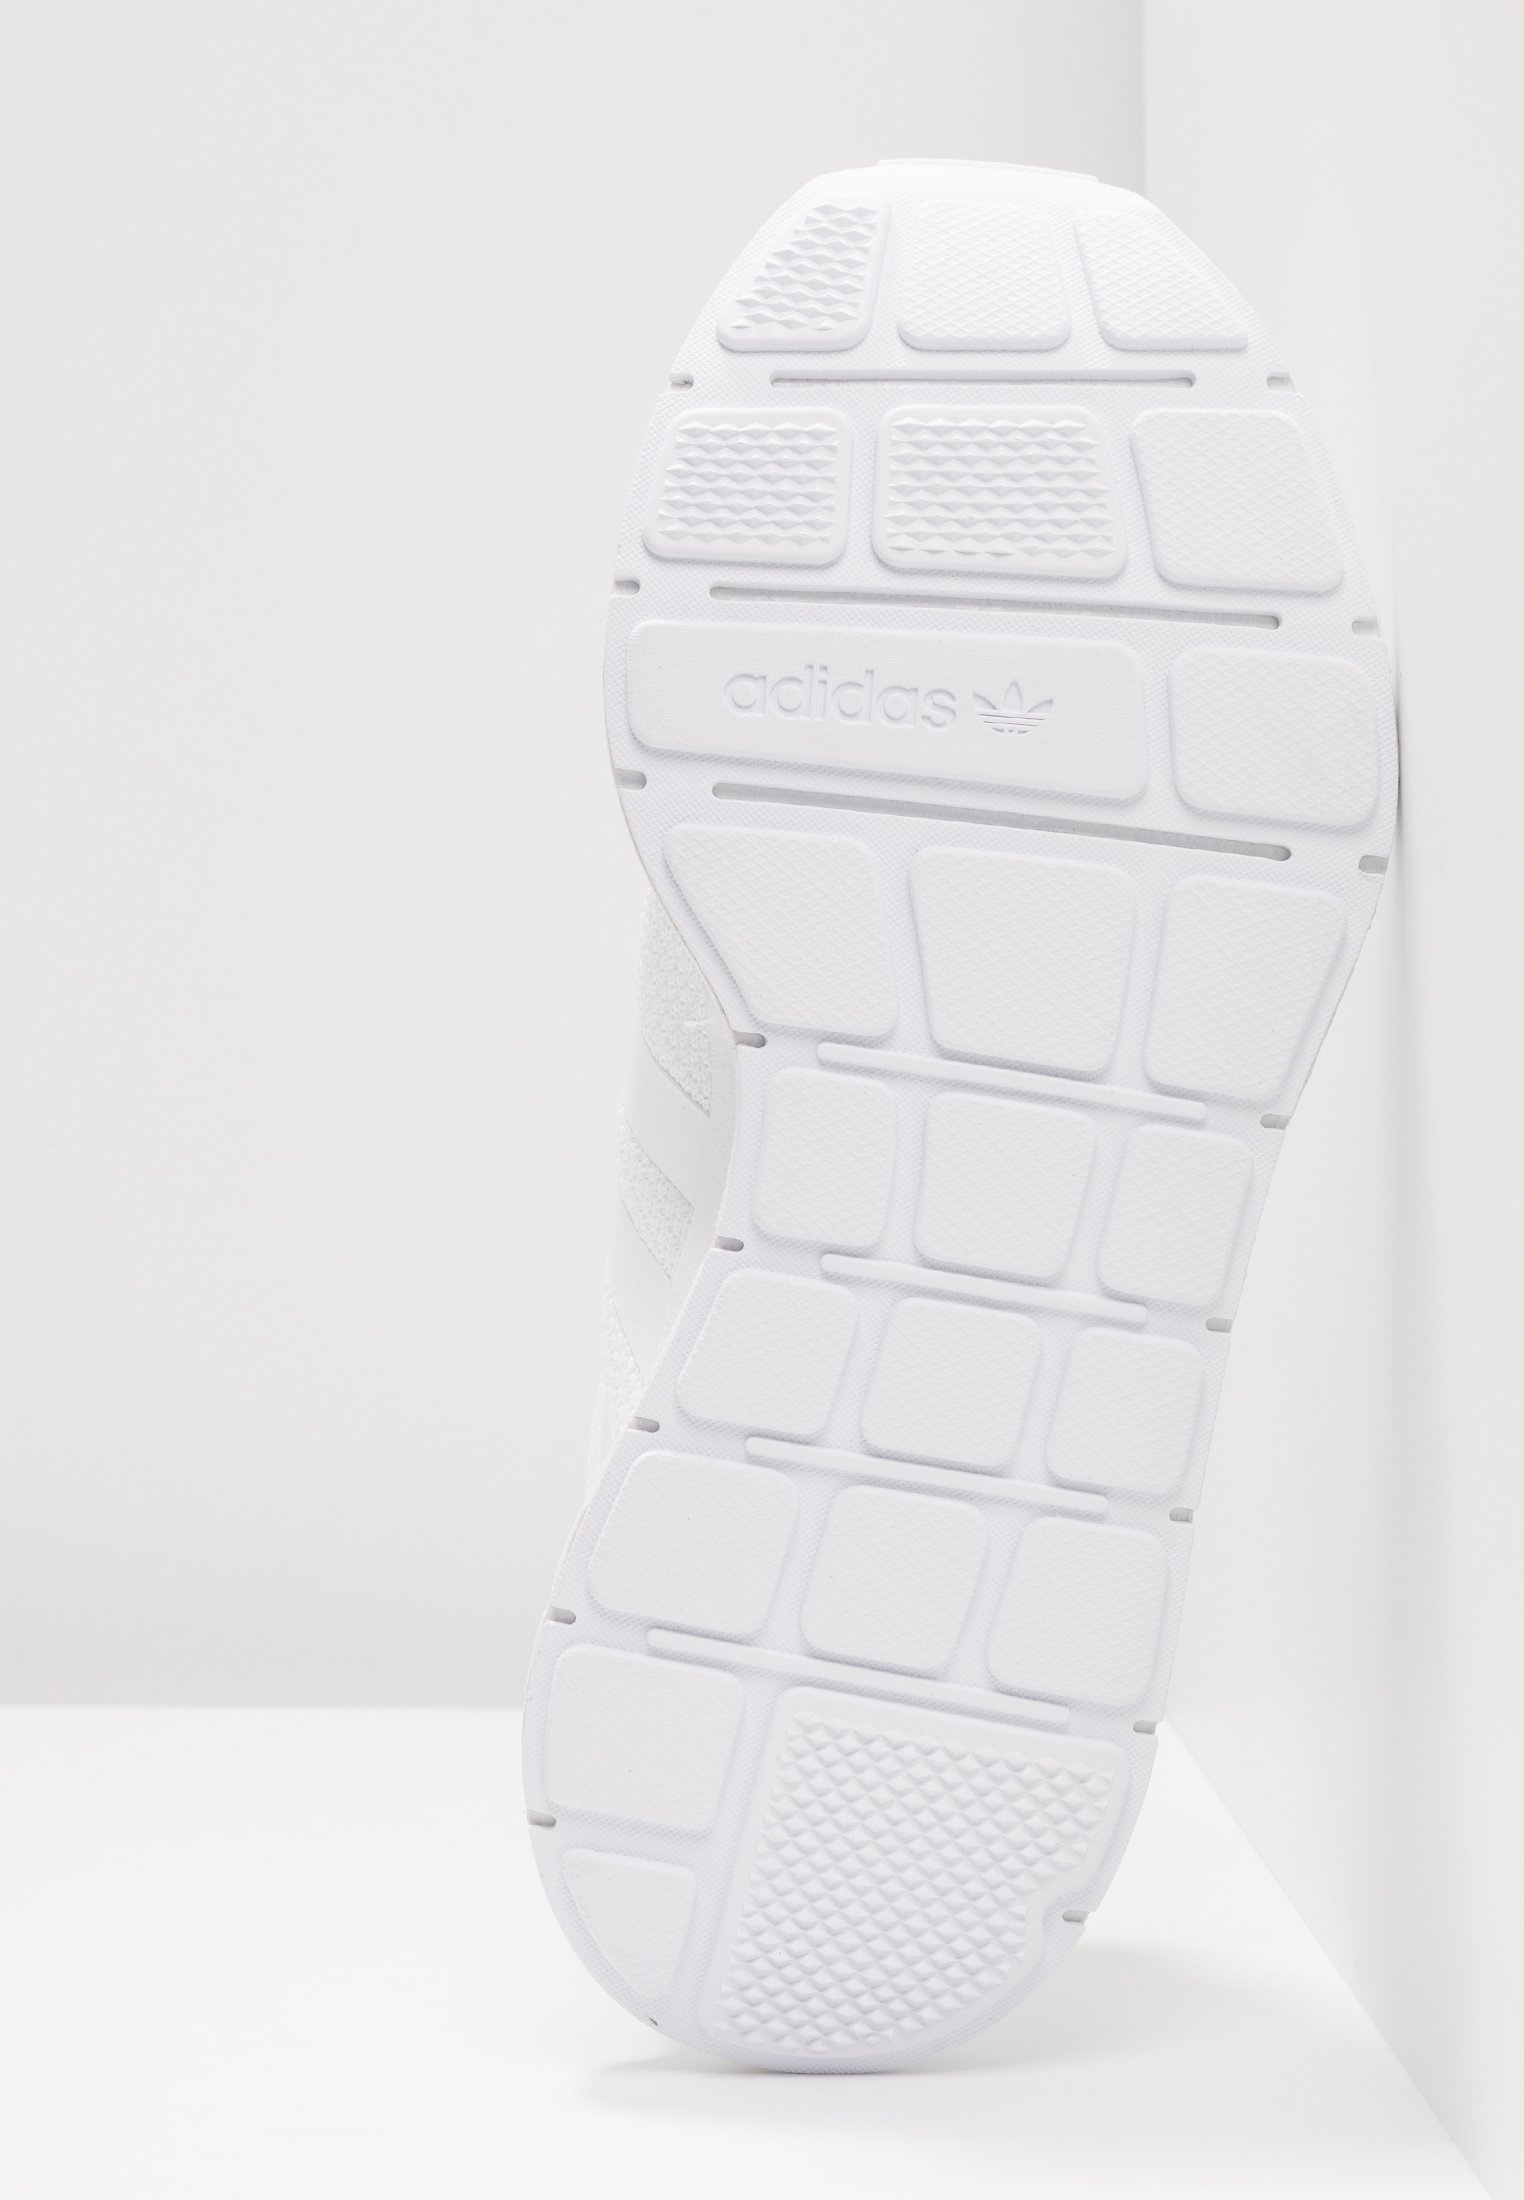 copper Adidas Swift Basse White Metallic Run Originals ExclusiveSneakers Footwear kXwn0O8P